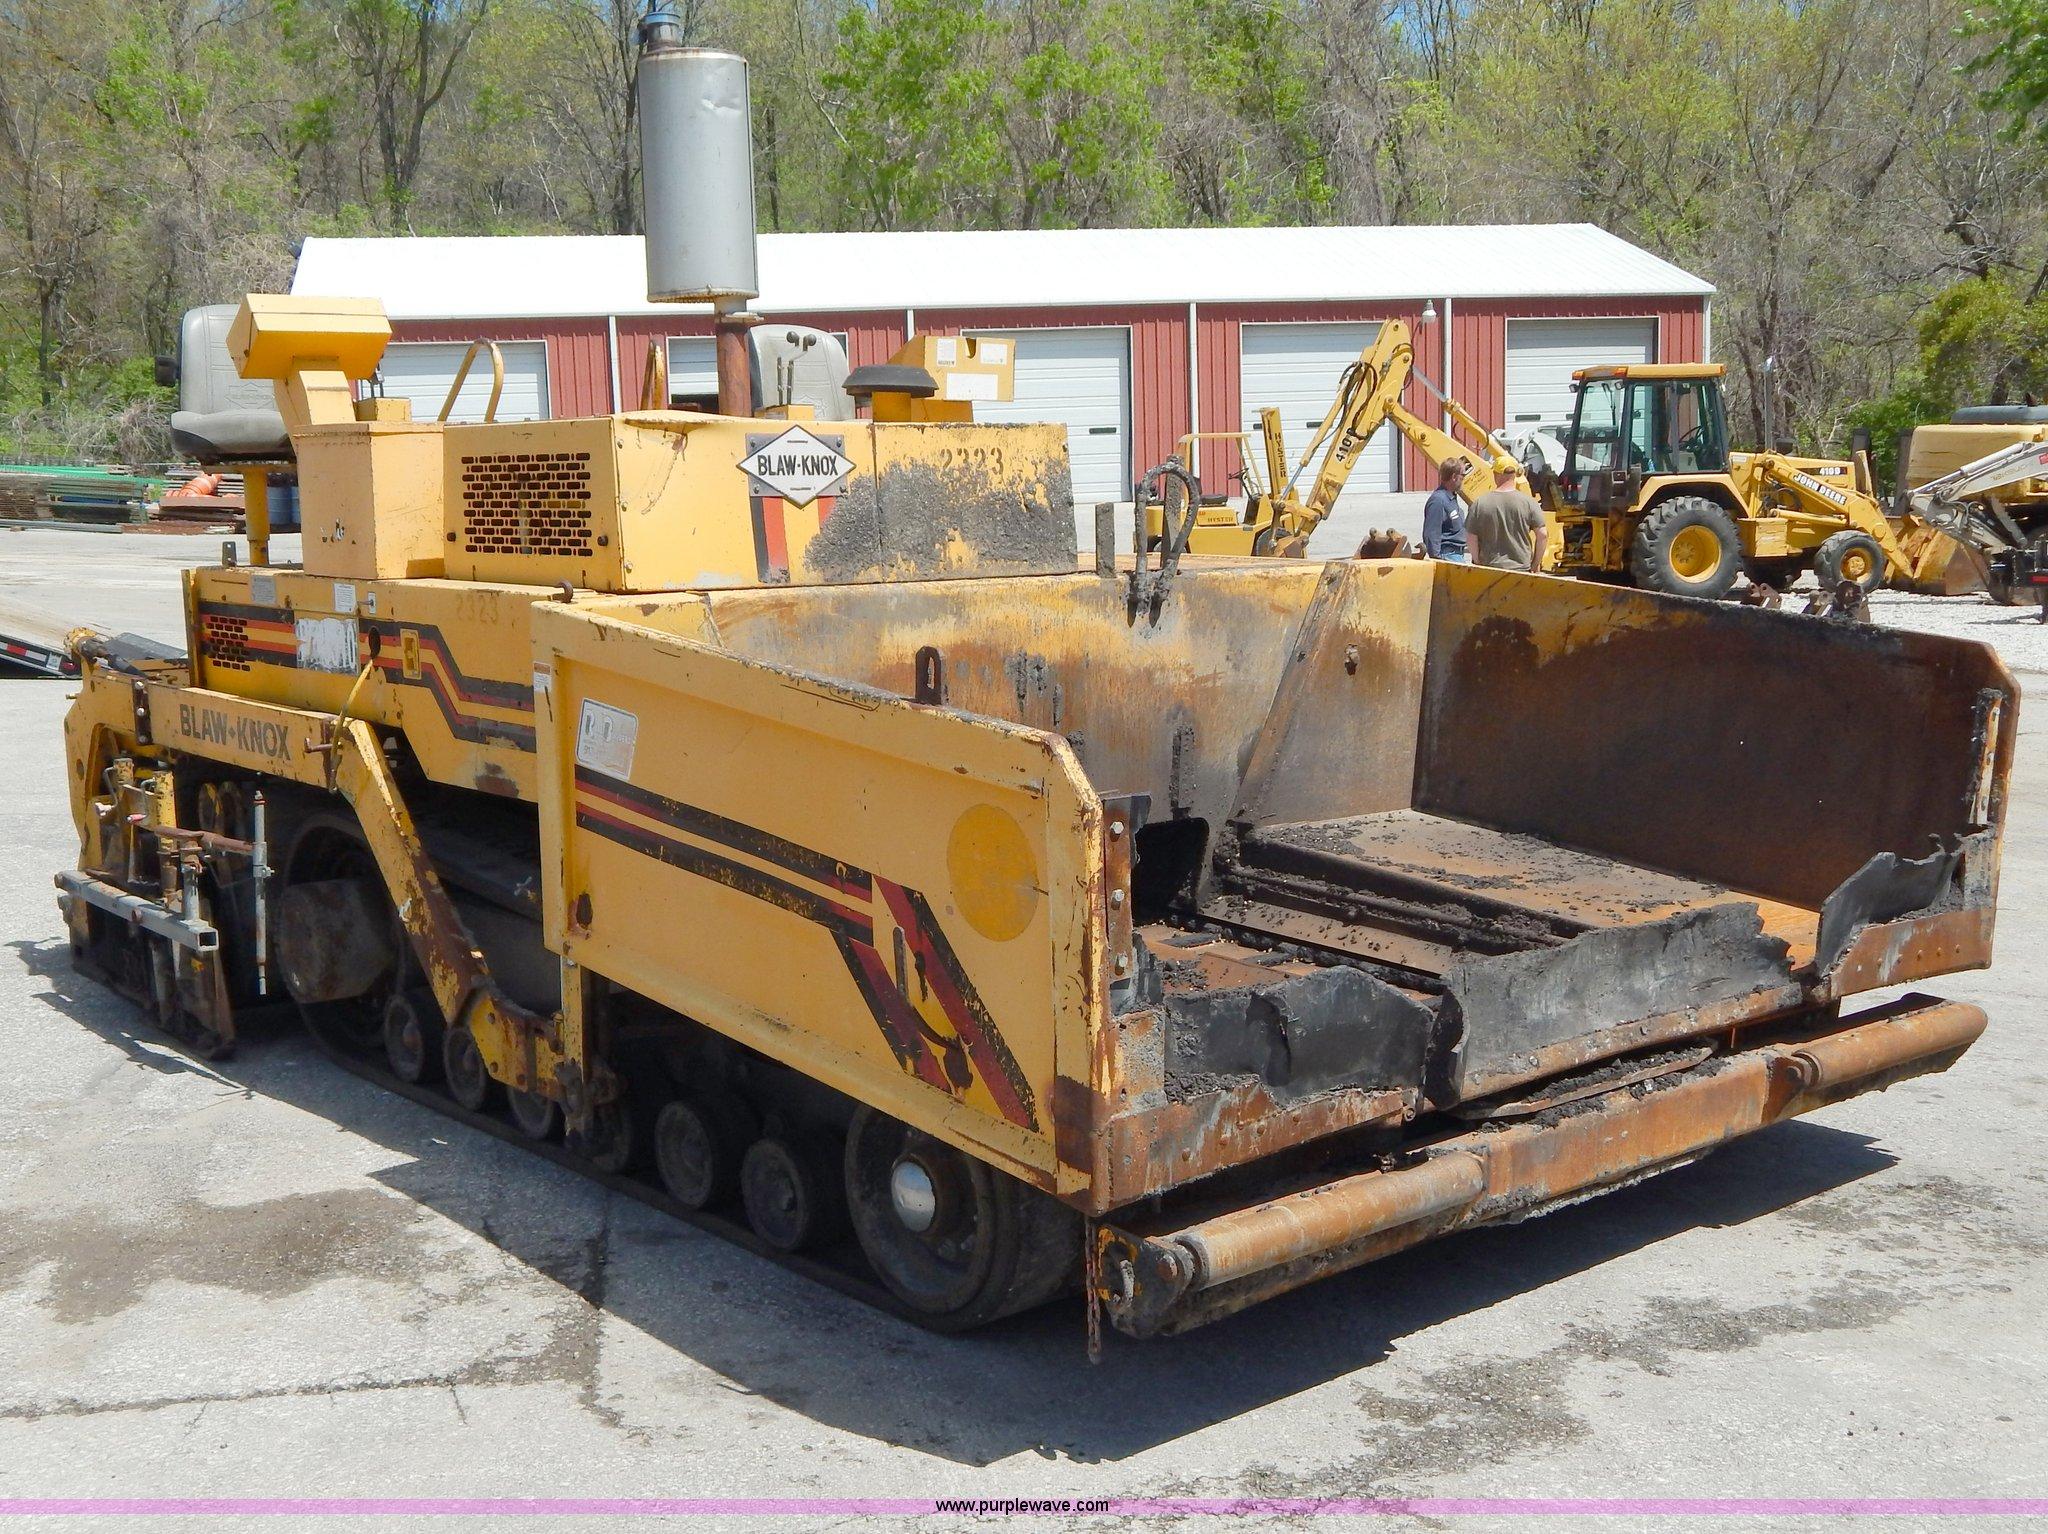 H3442 image for item H3442 2000 Blaw-Knox PF5510 crawler asphalt paver